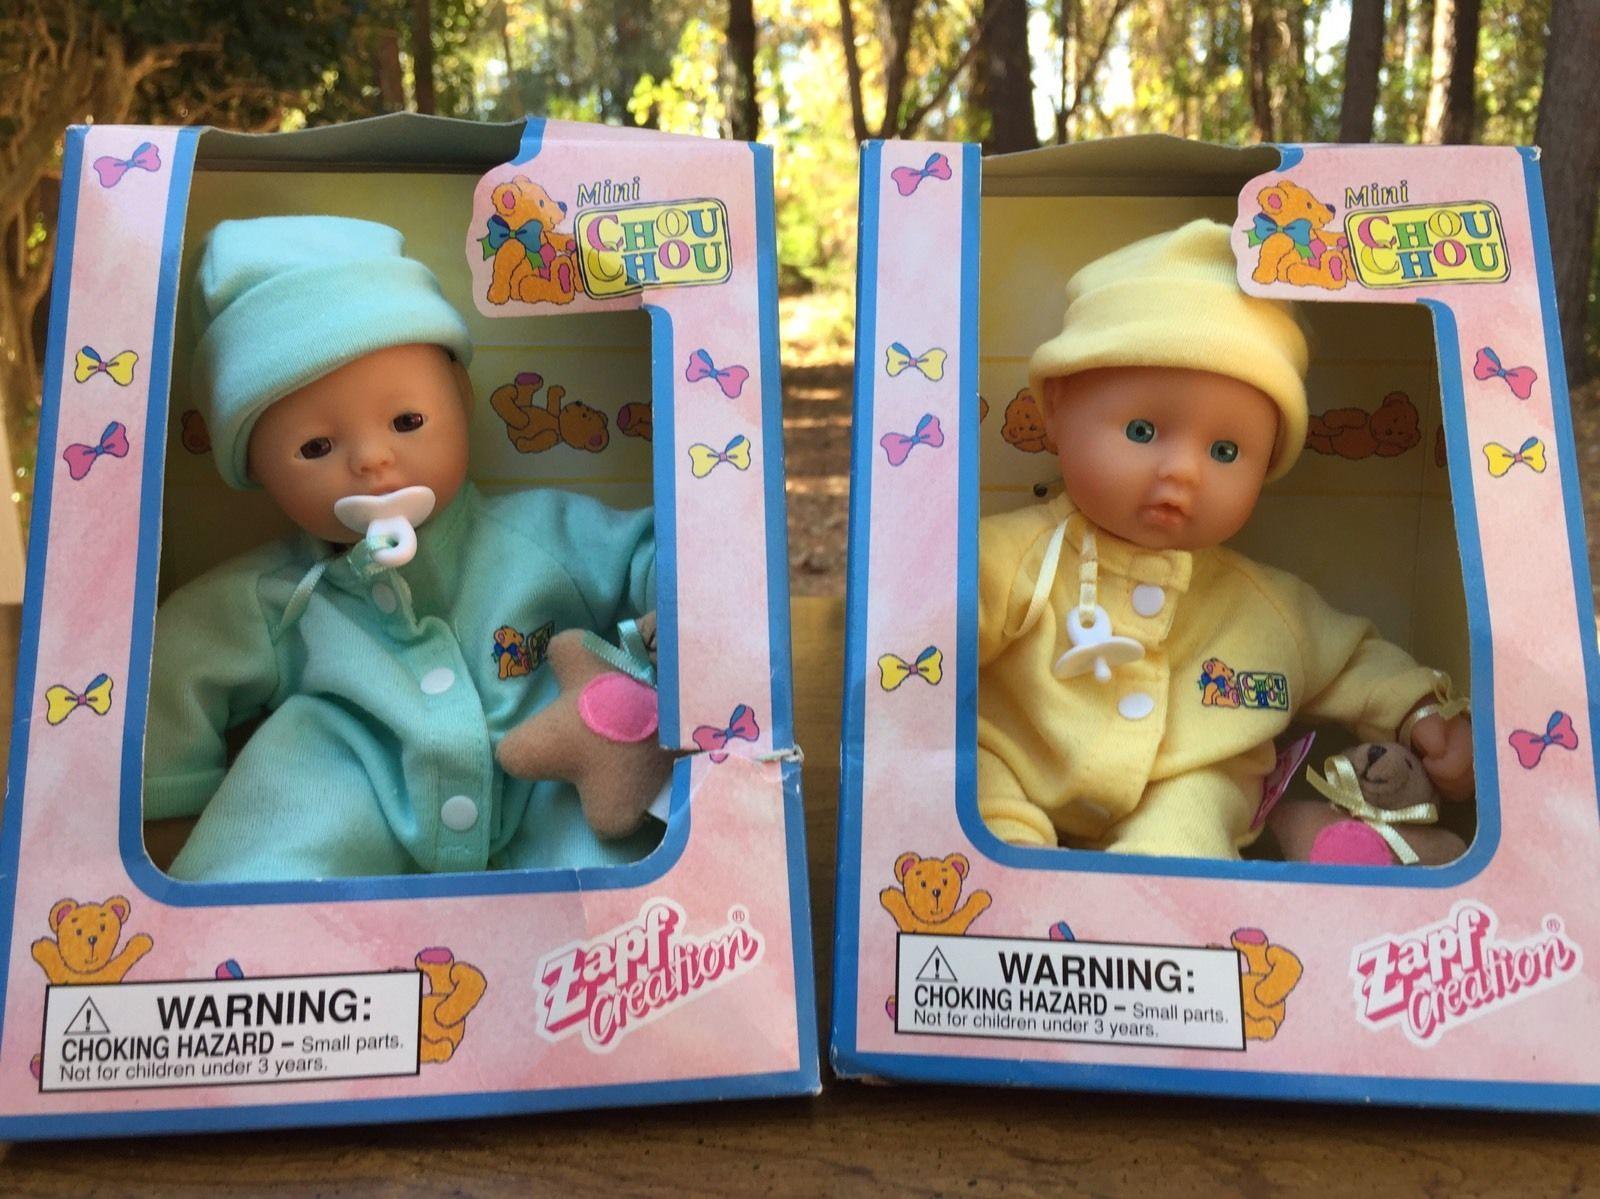 Zapf Creations Lot 2 Mini Chou Chou Baby Dolls New In